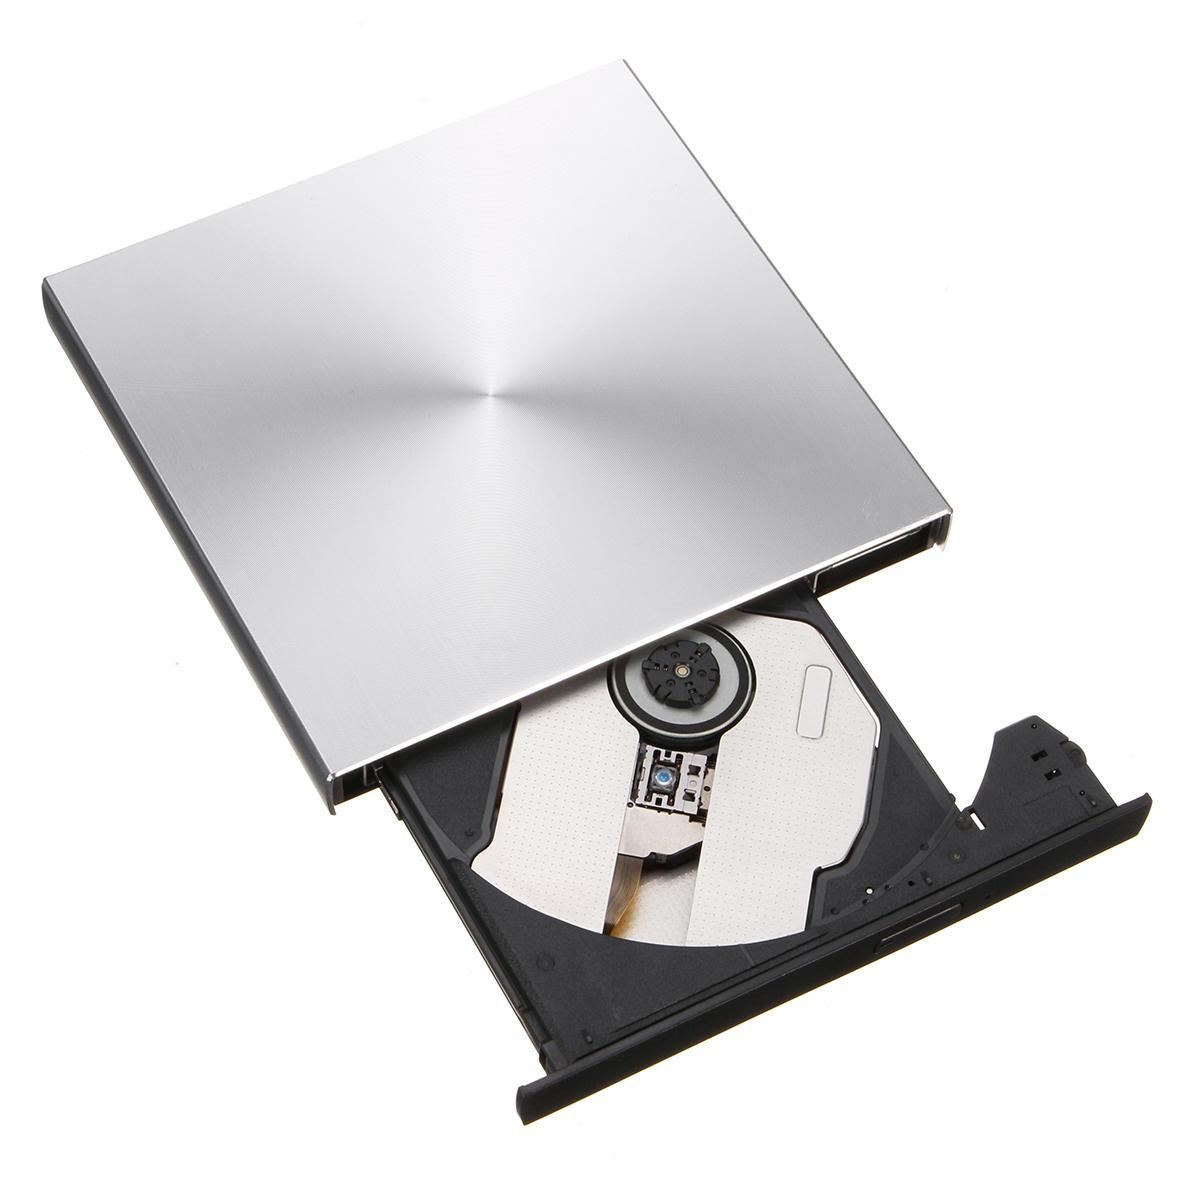 Портативный внешний Тонкий USB 3.0 Pop-Up DVD-RW / CD-RW Рекордер для рекордера с оптическим приводом